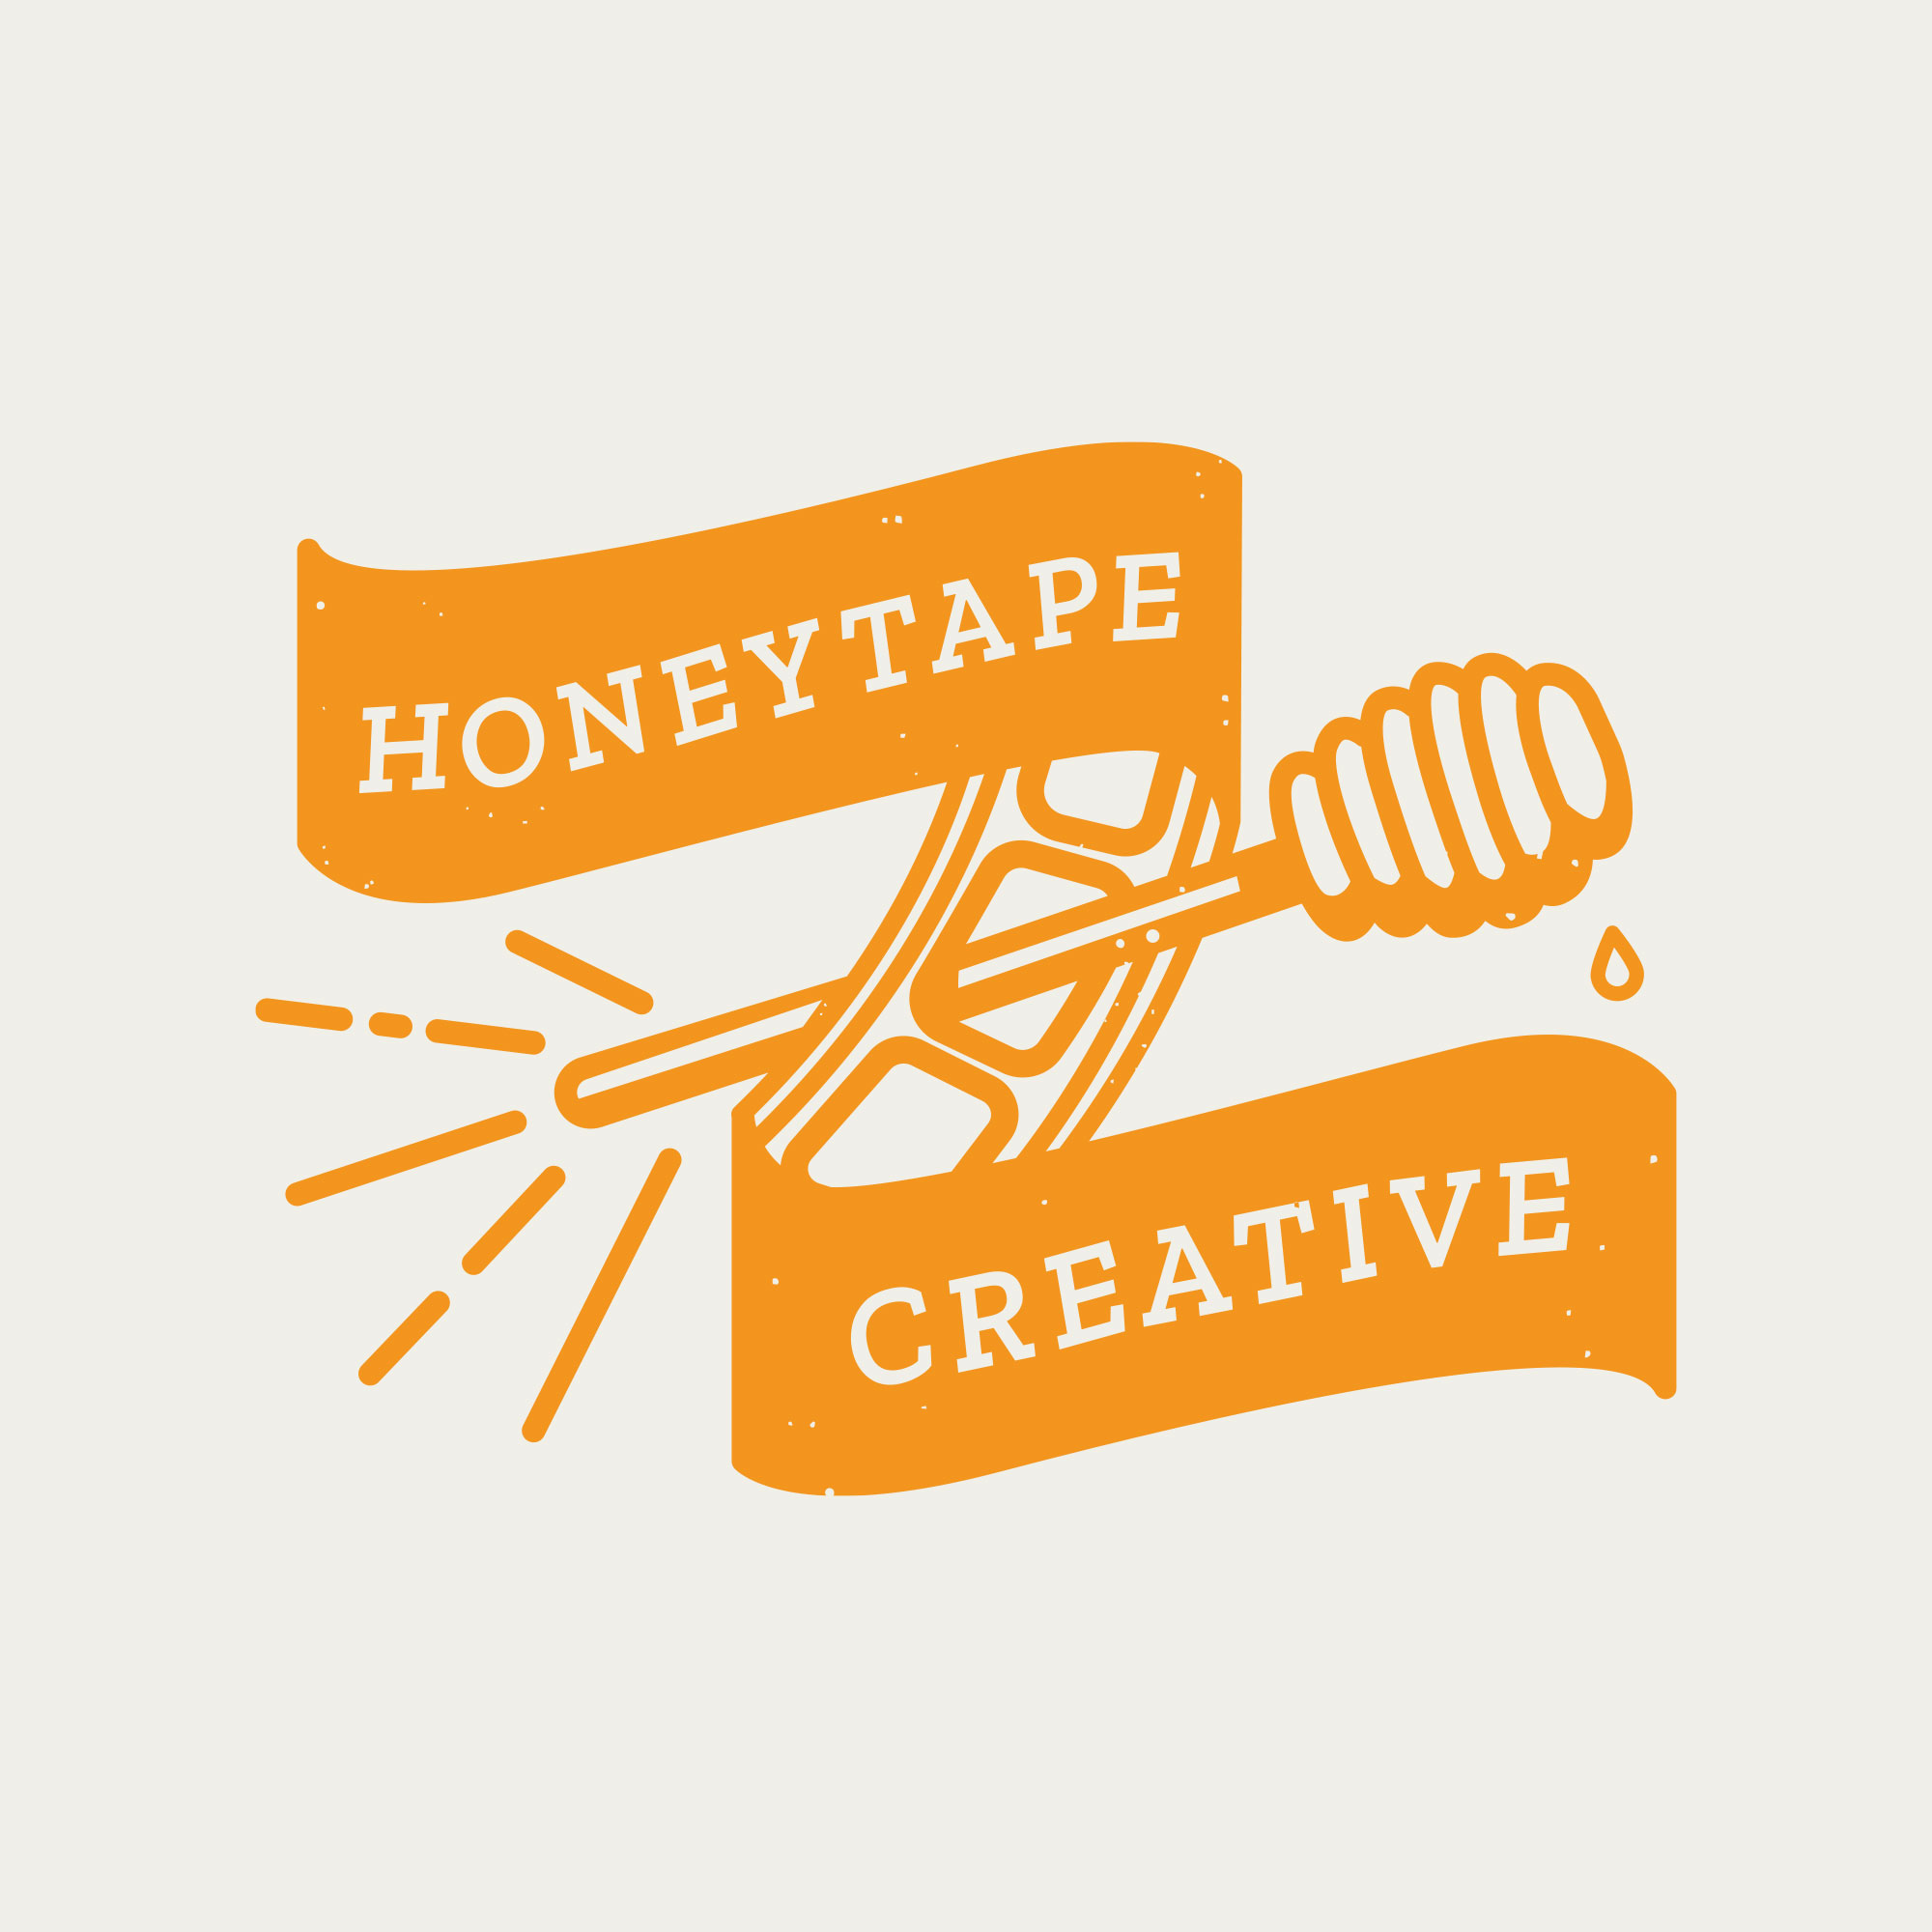 Honeytape Creative Branding by Buttercrumble